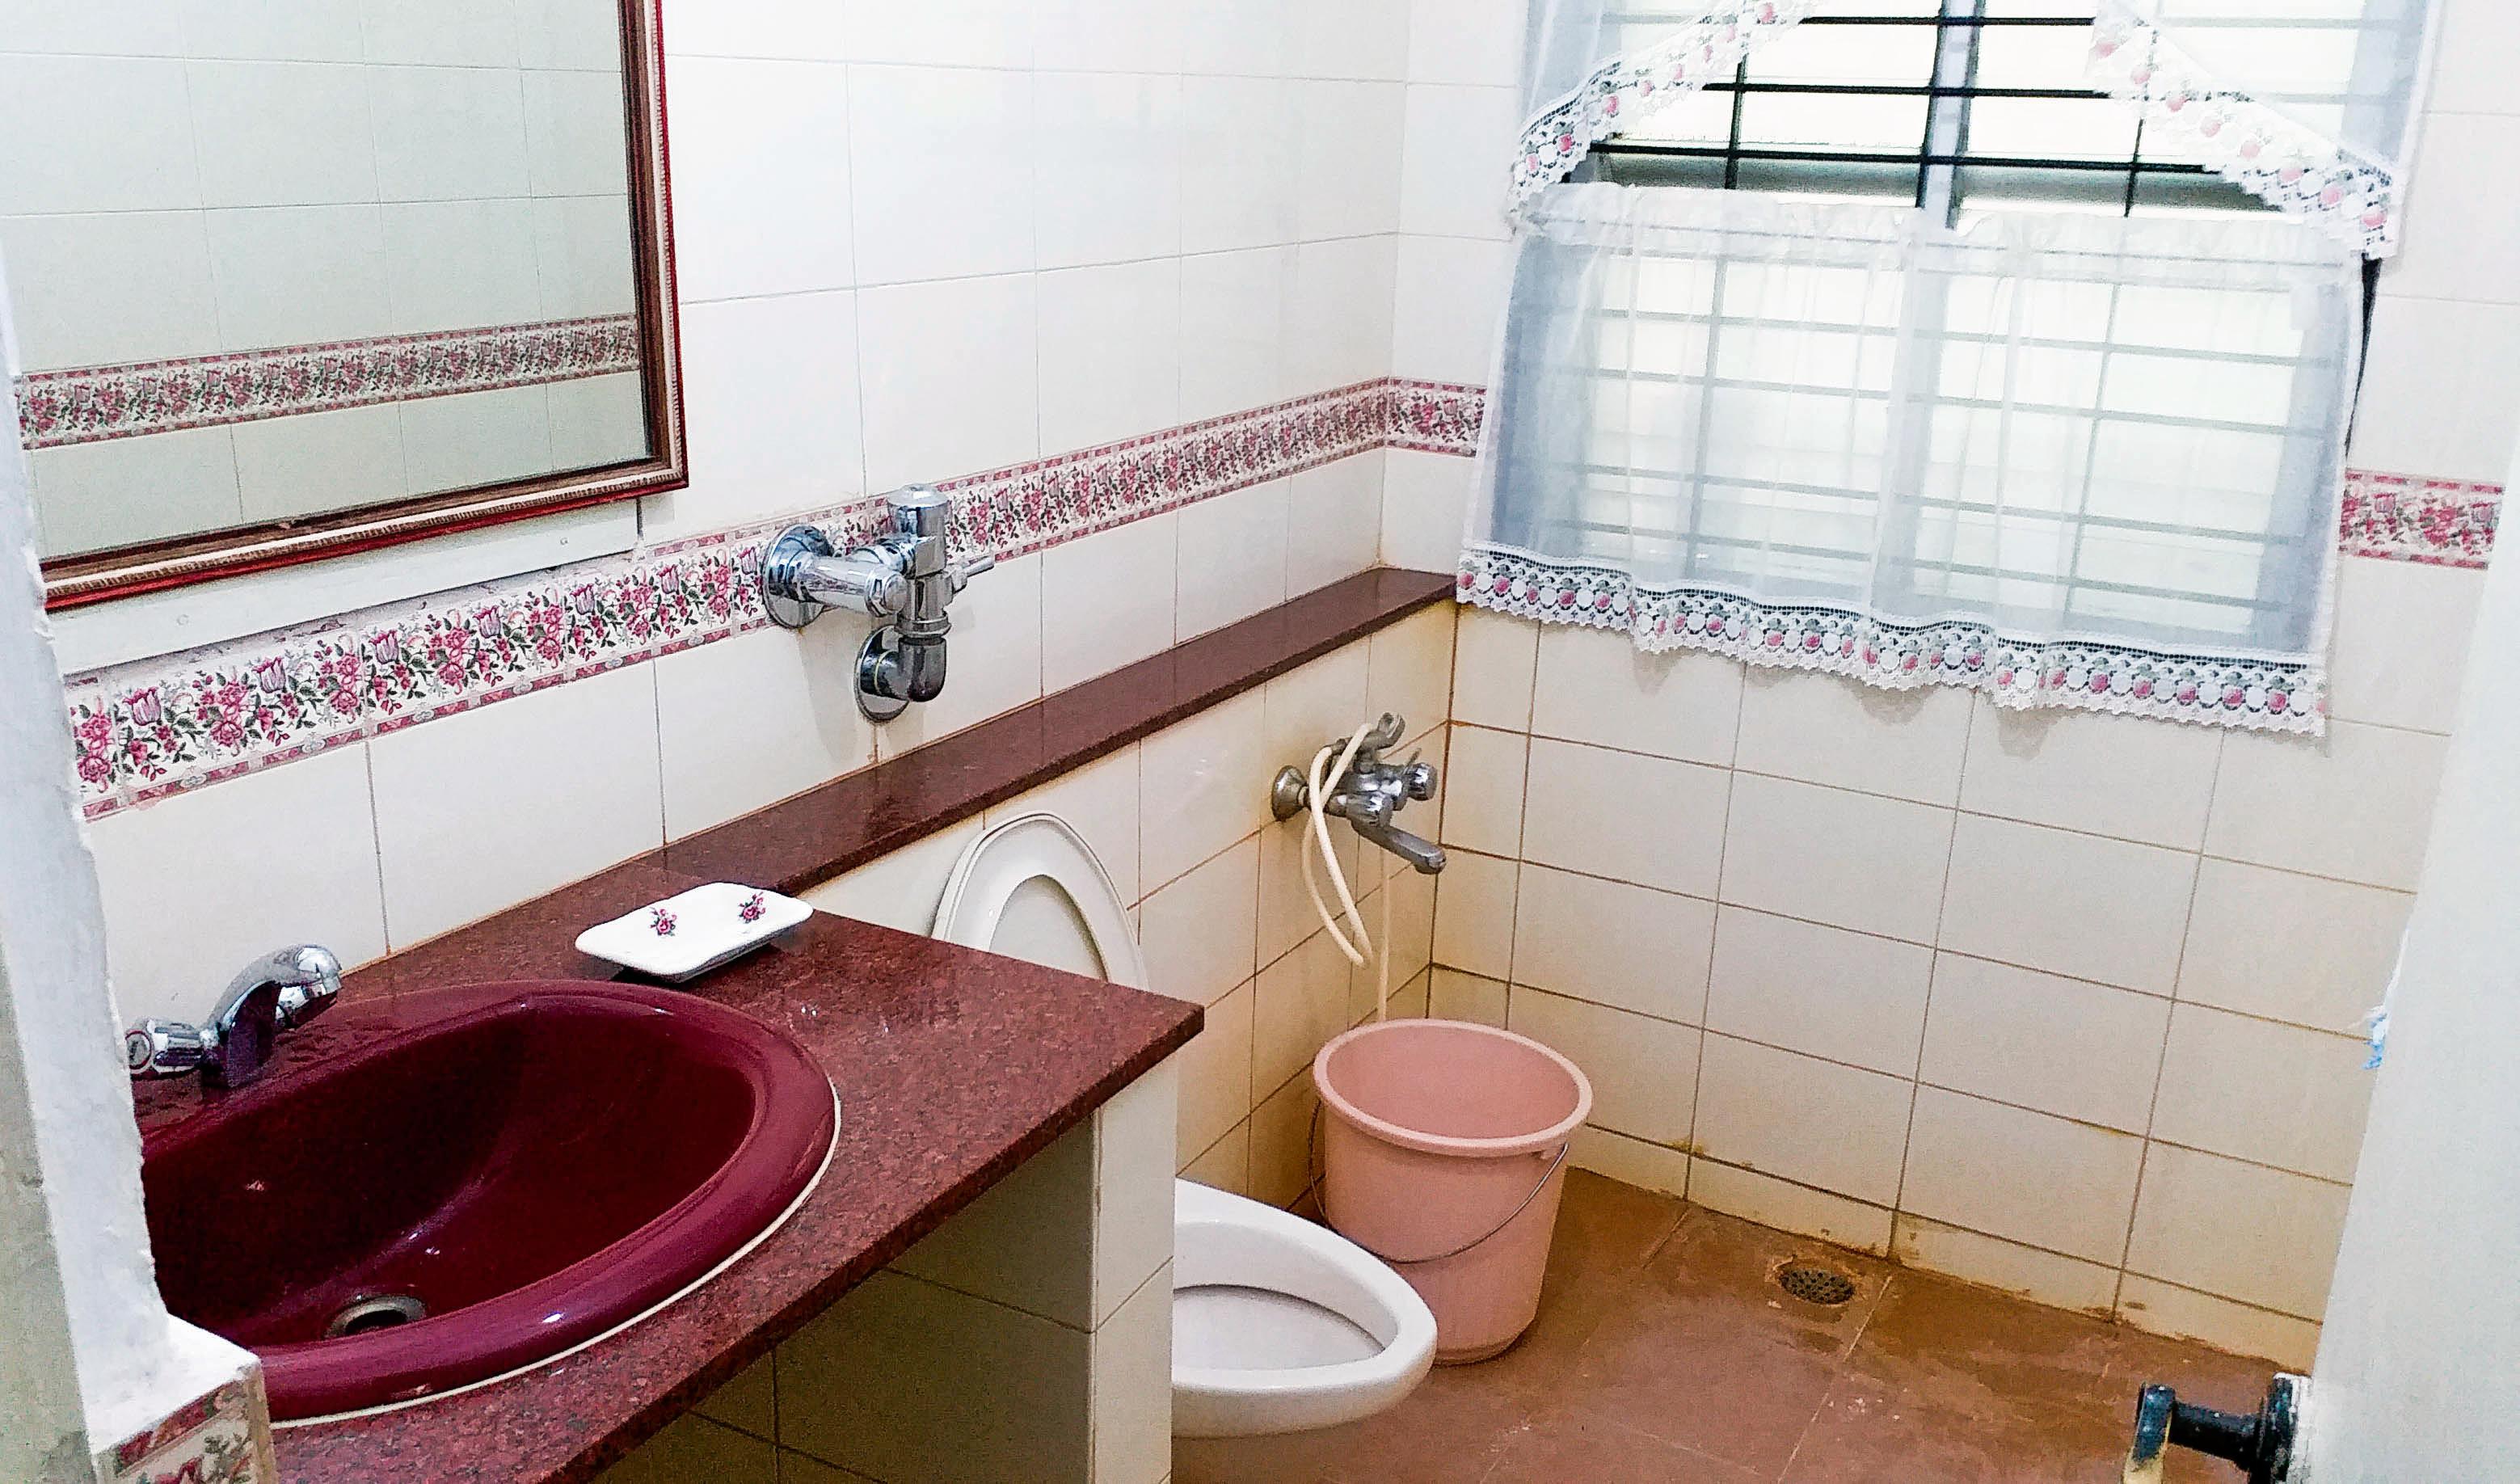 1559379047_bedroom1b_ivrqo8.jpg